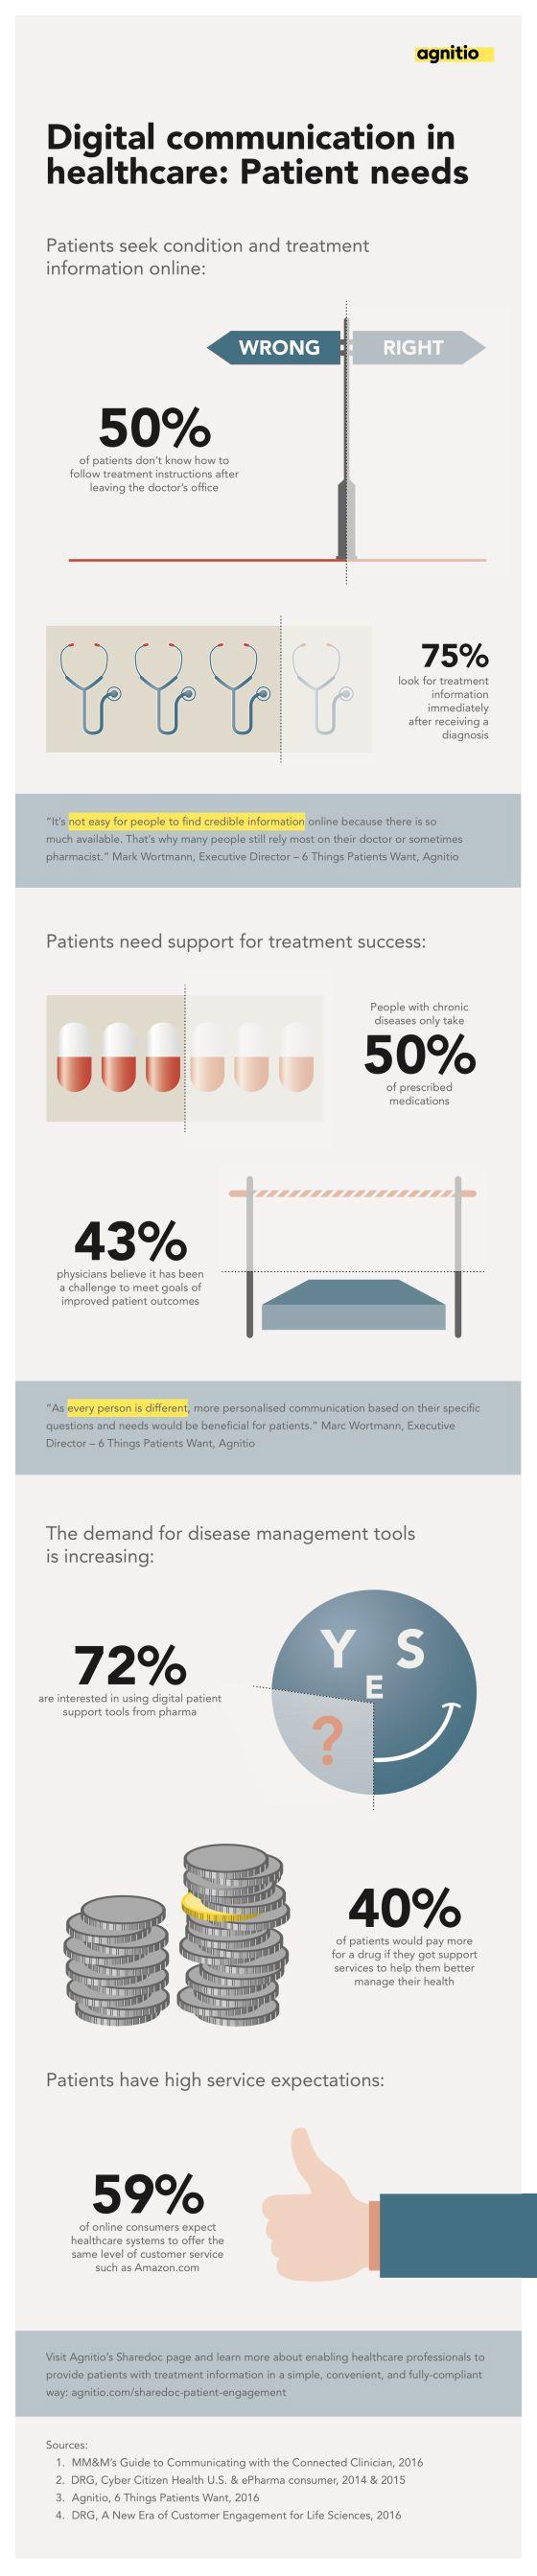 Infographic Digital Communication in #Healthcare: Patients Needs